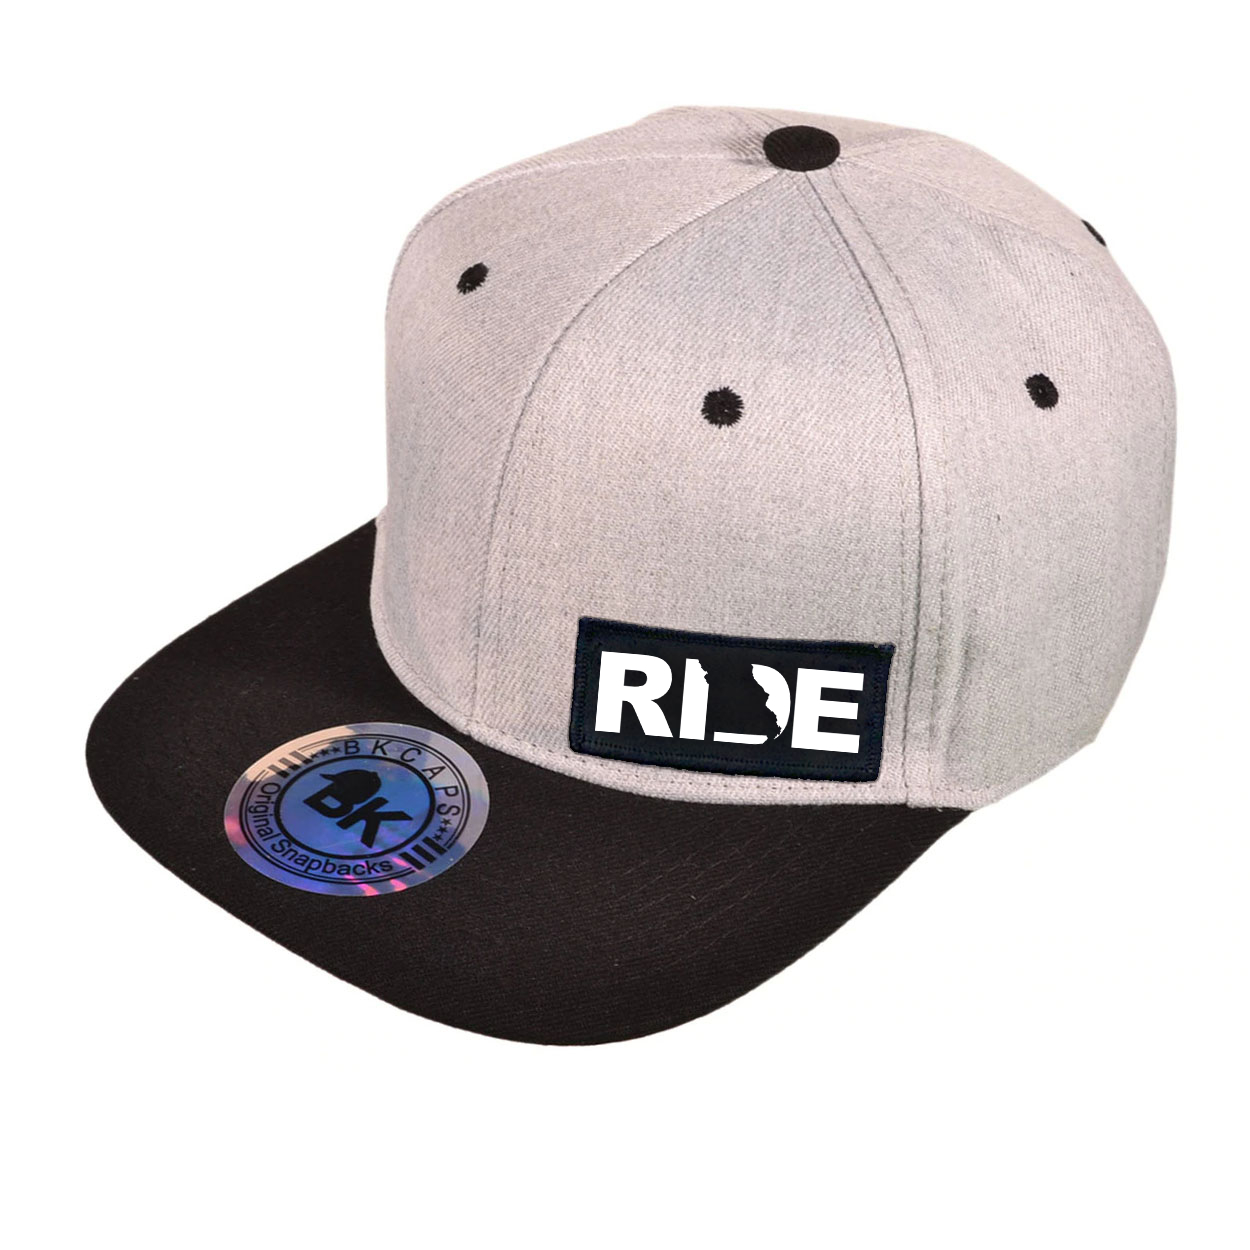 Ride Missouri Night Out Woven Patch Snapback Flat Brim Hat Heather Gray/Black (White Logo)